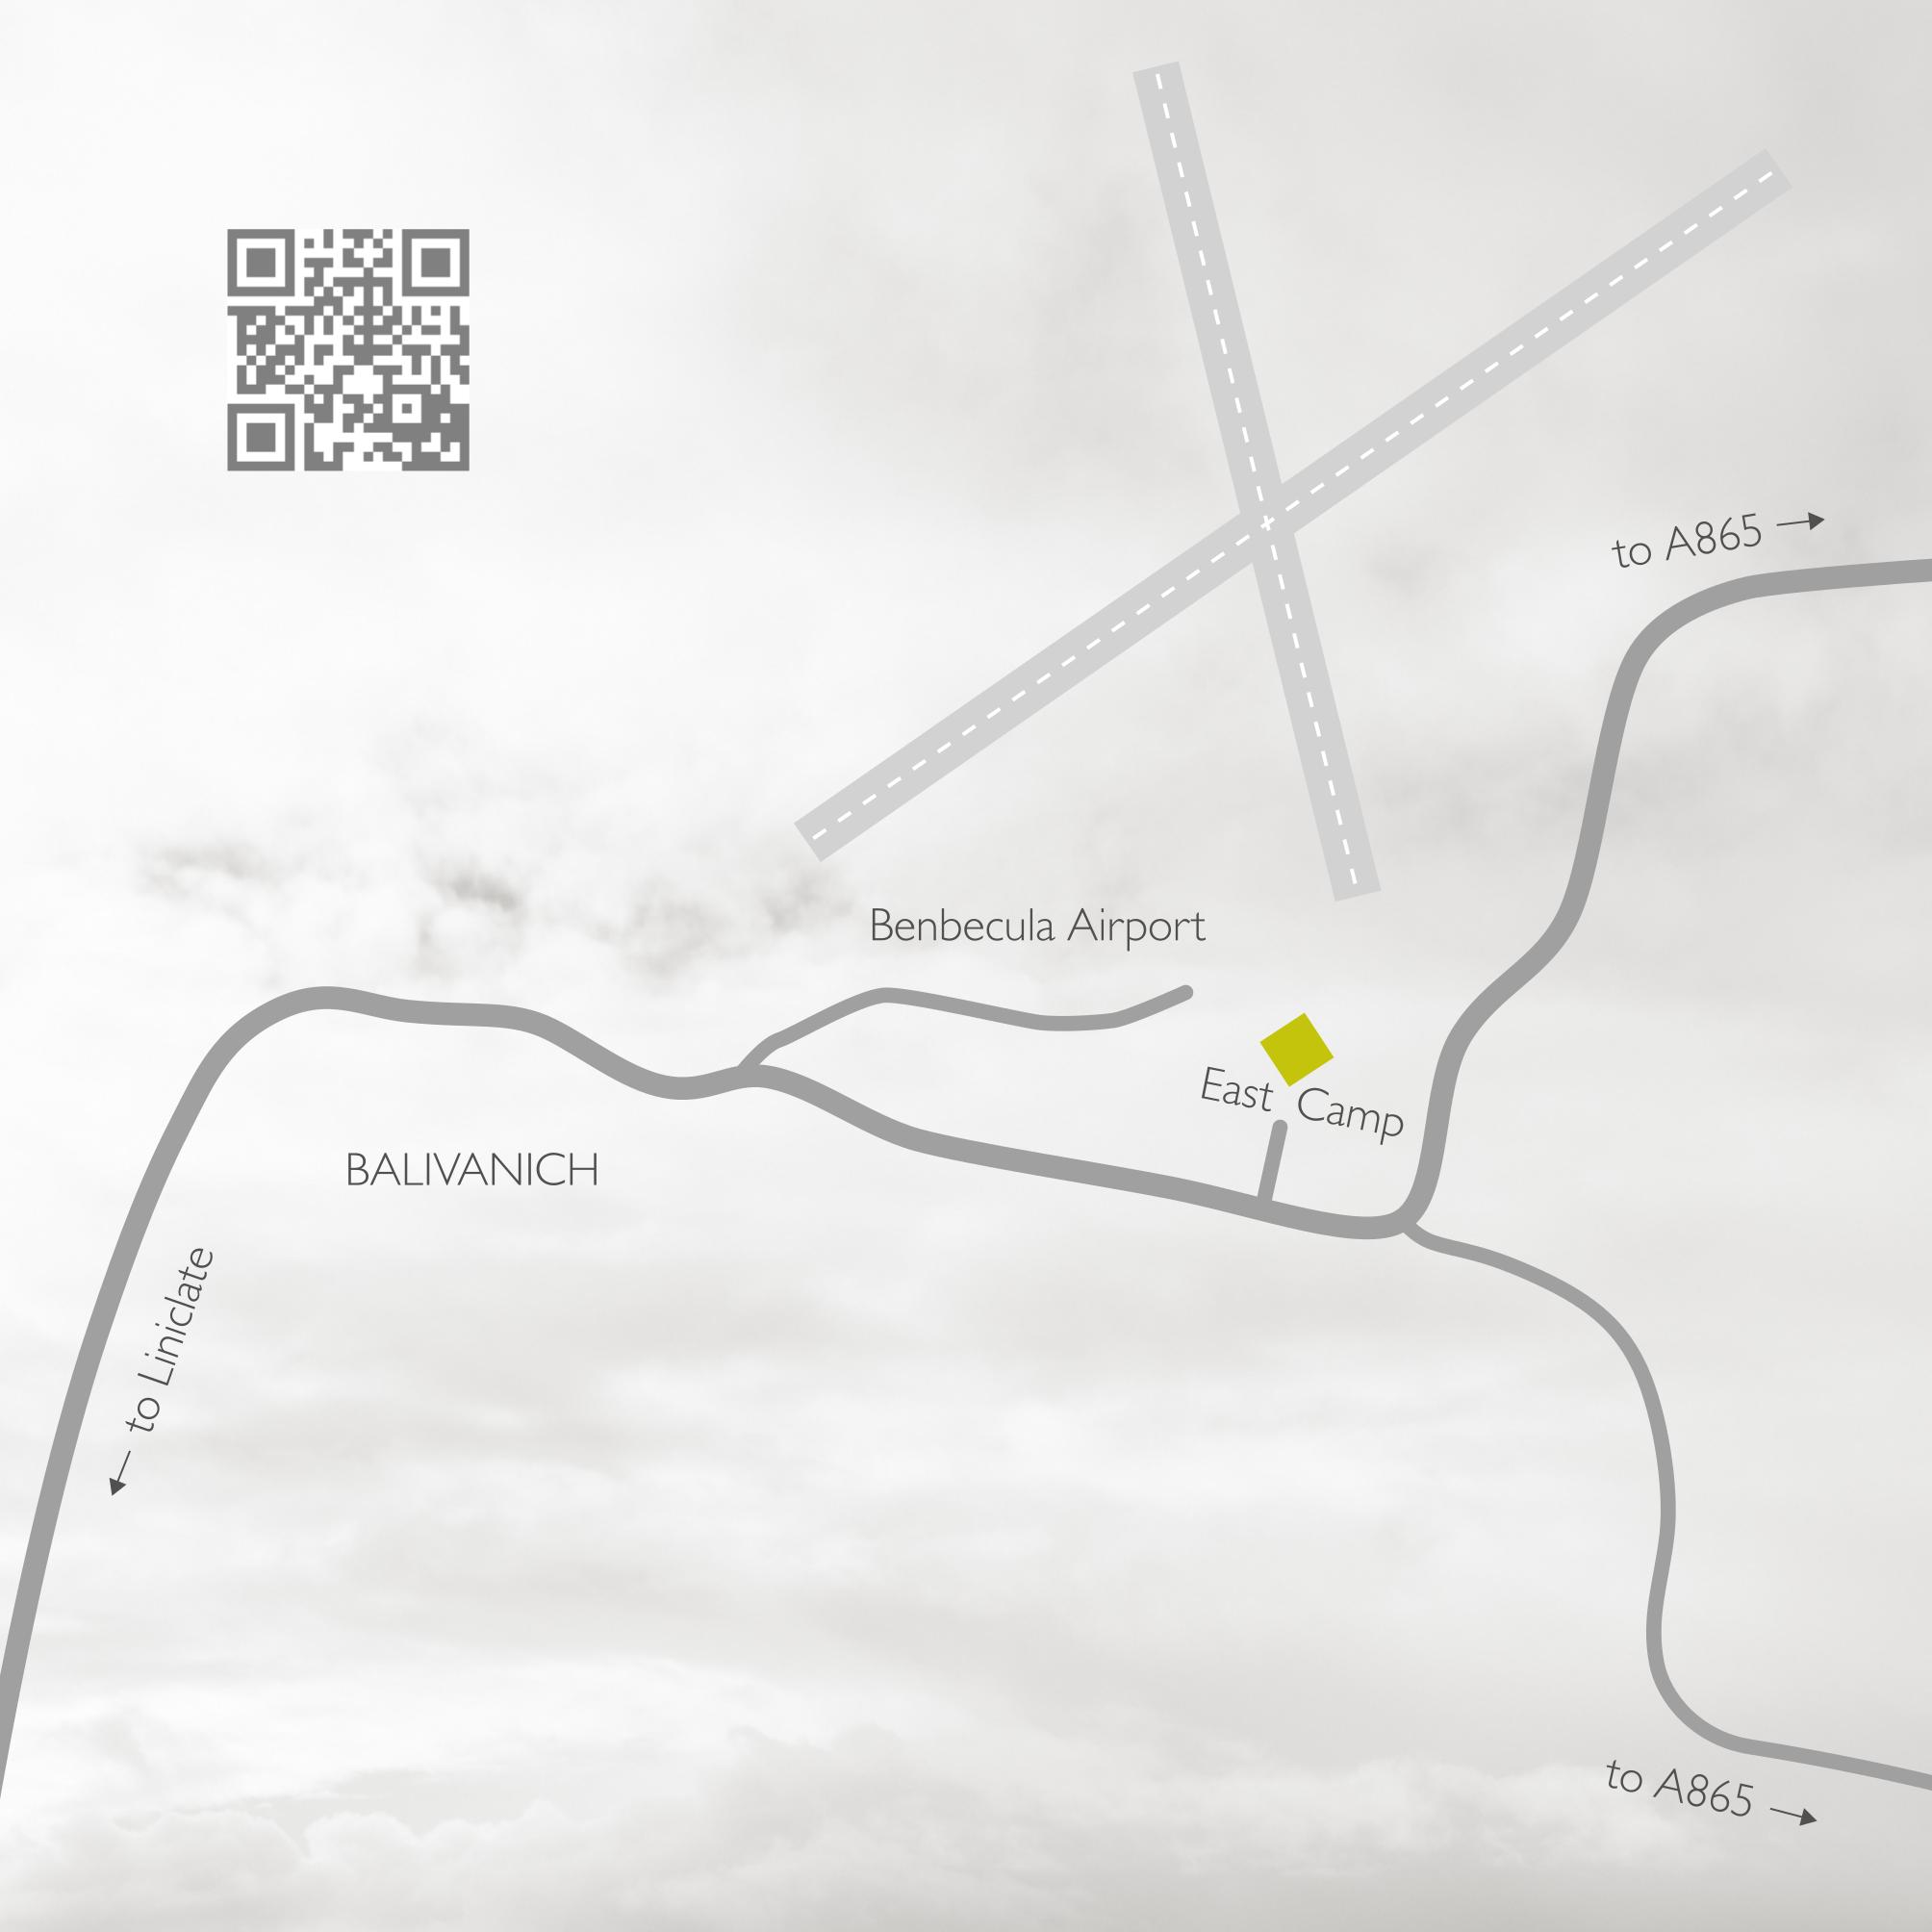 Studio Verisimilitude  East Camp, Balivanich, Isle of Benbecula, HS7 5LA